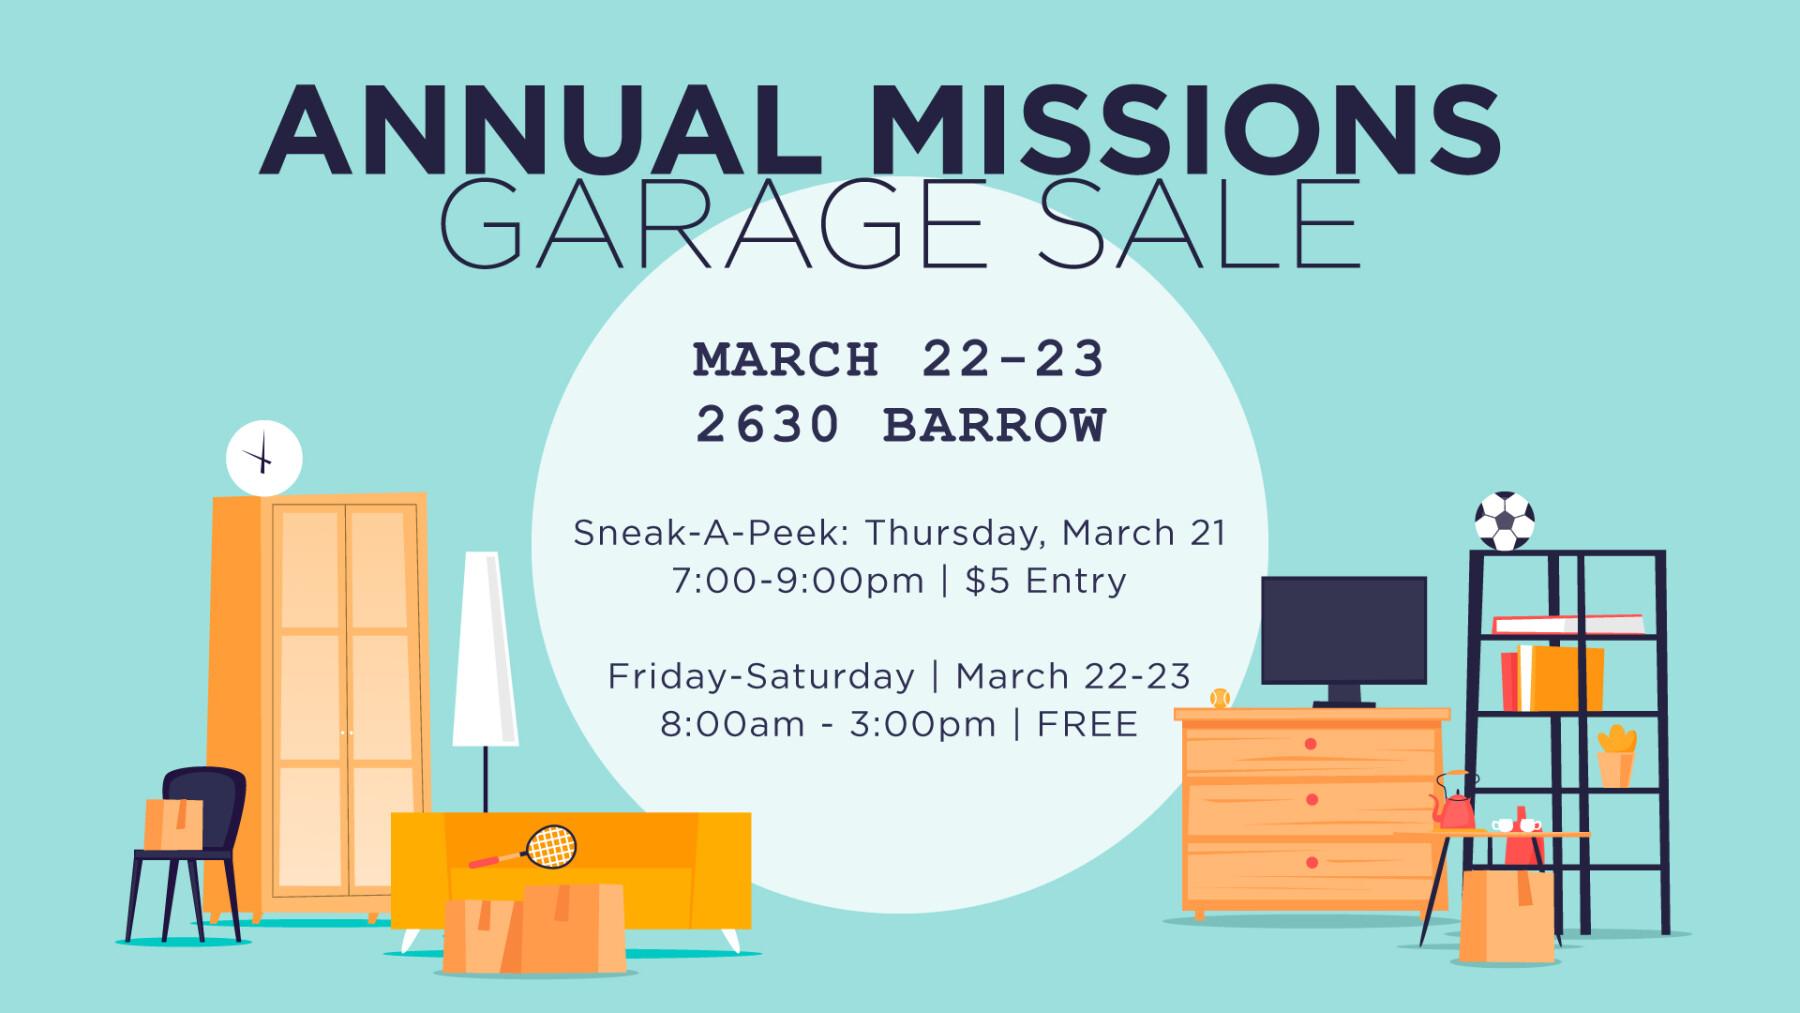 Beltway Missions Garage Sale THURSDAY